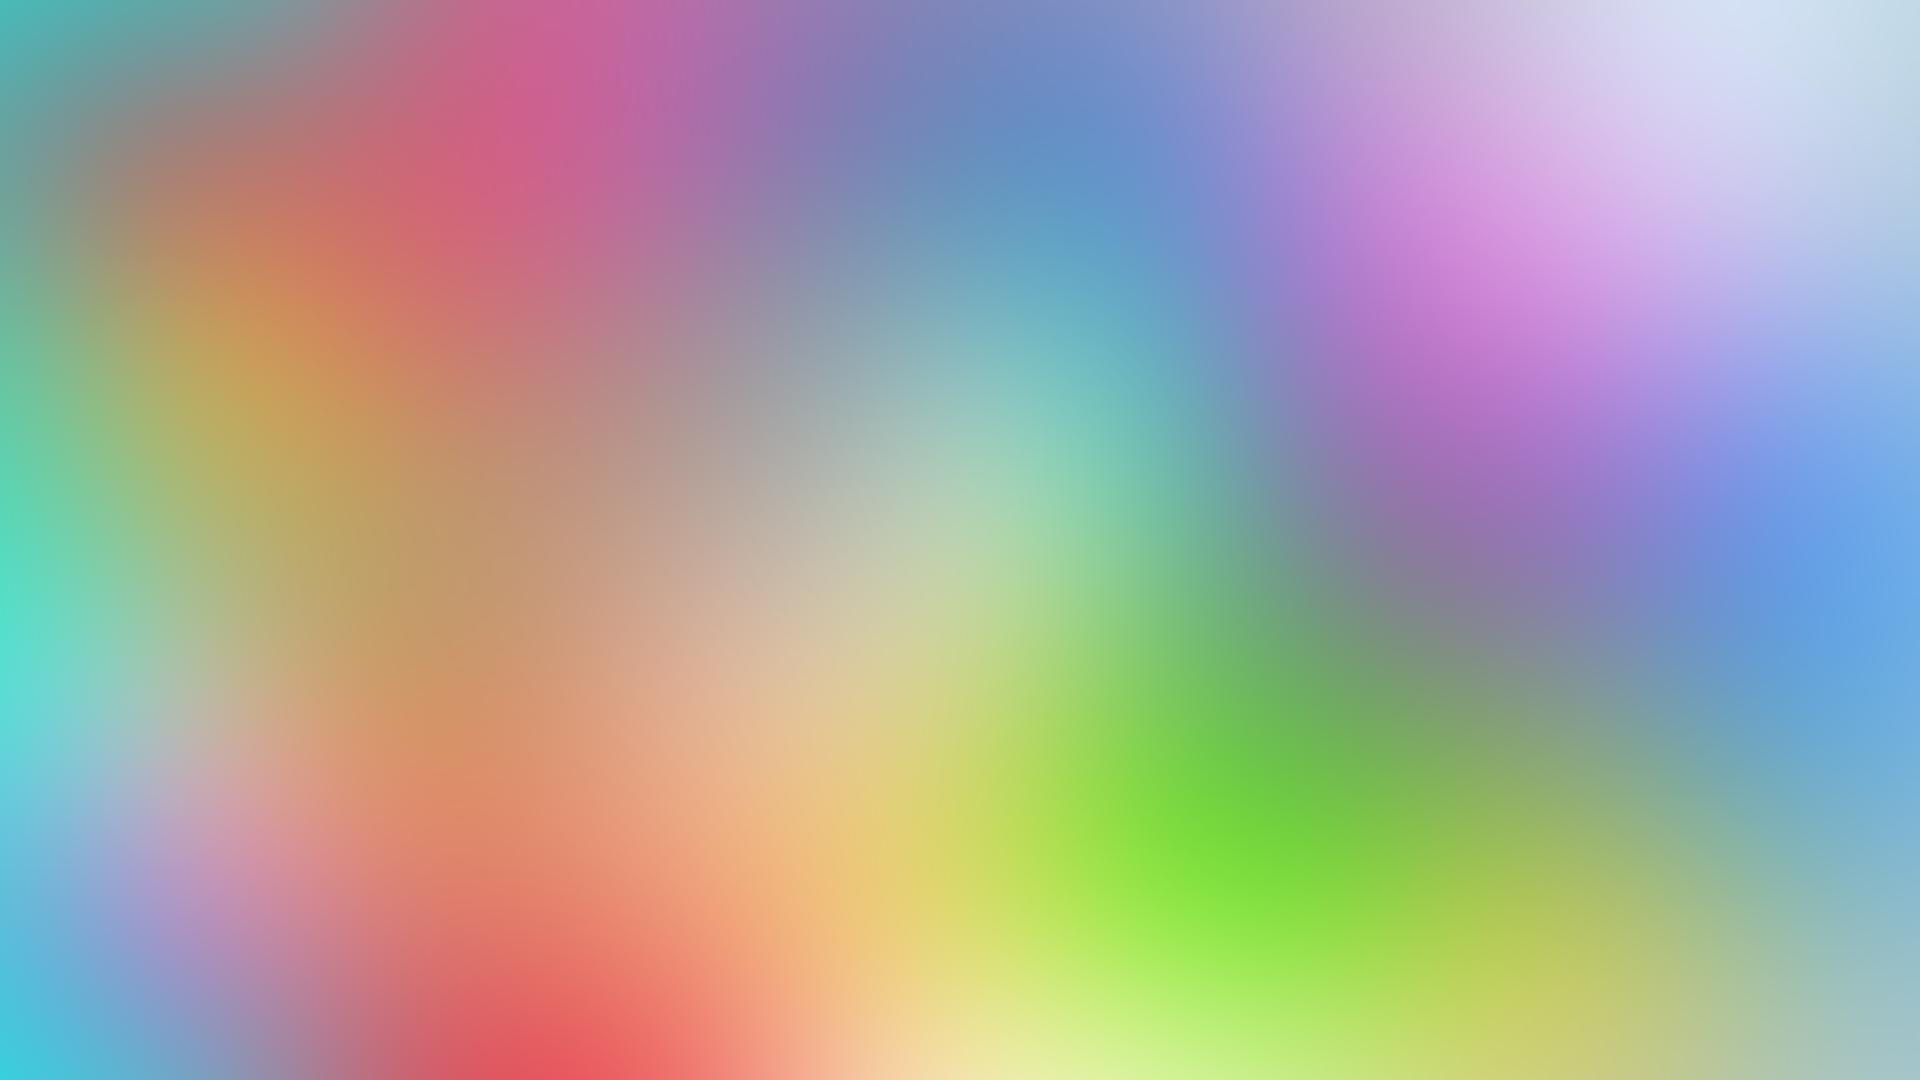 Bright Color Blend By Jayro Jones On Deviantart